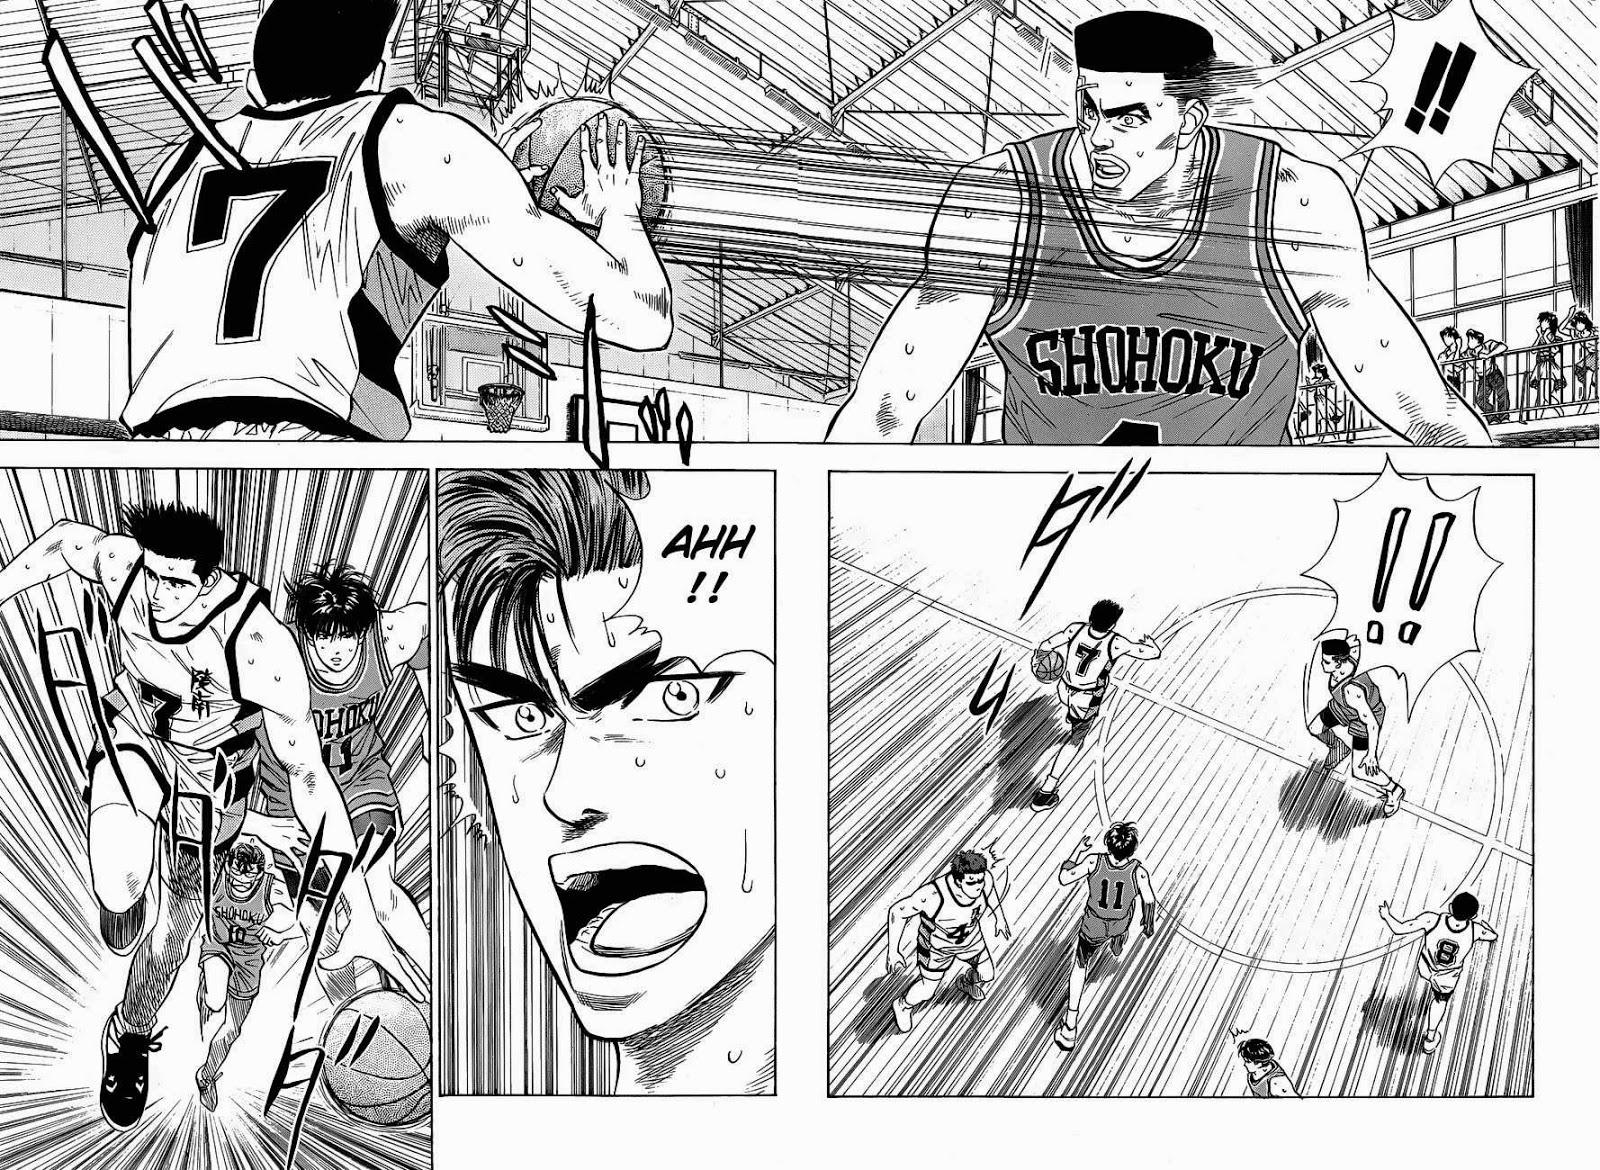 Komik slam dunk 047 - chapter 47 48 Indonesia slam dunk 047 - chapter 47 Terbaru 12|Baca Manga Komik Indonesia|